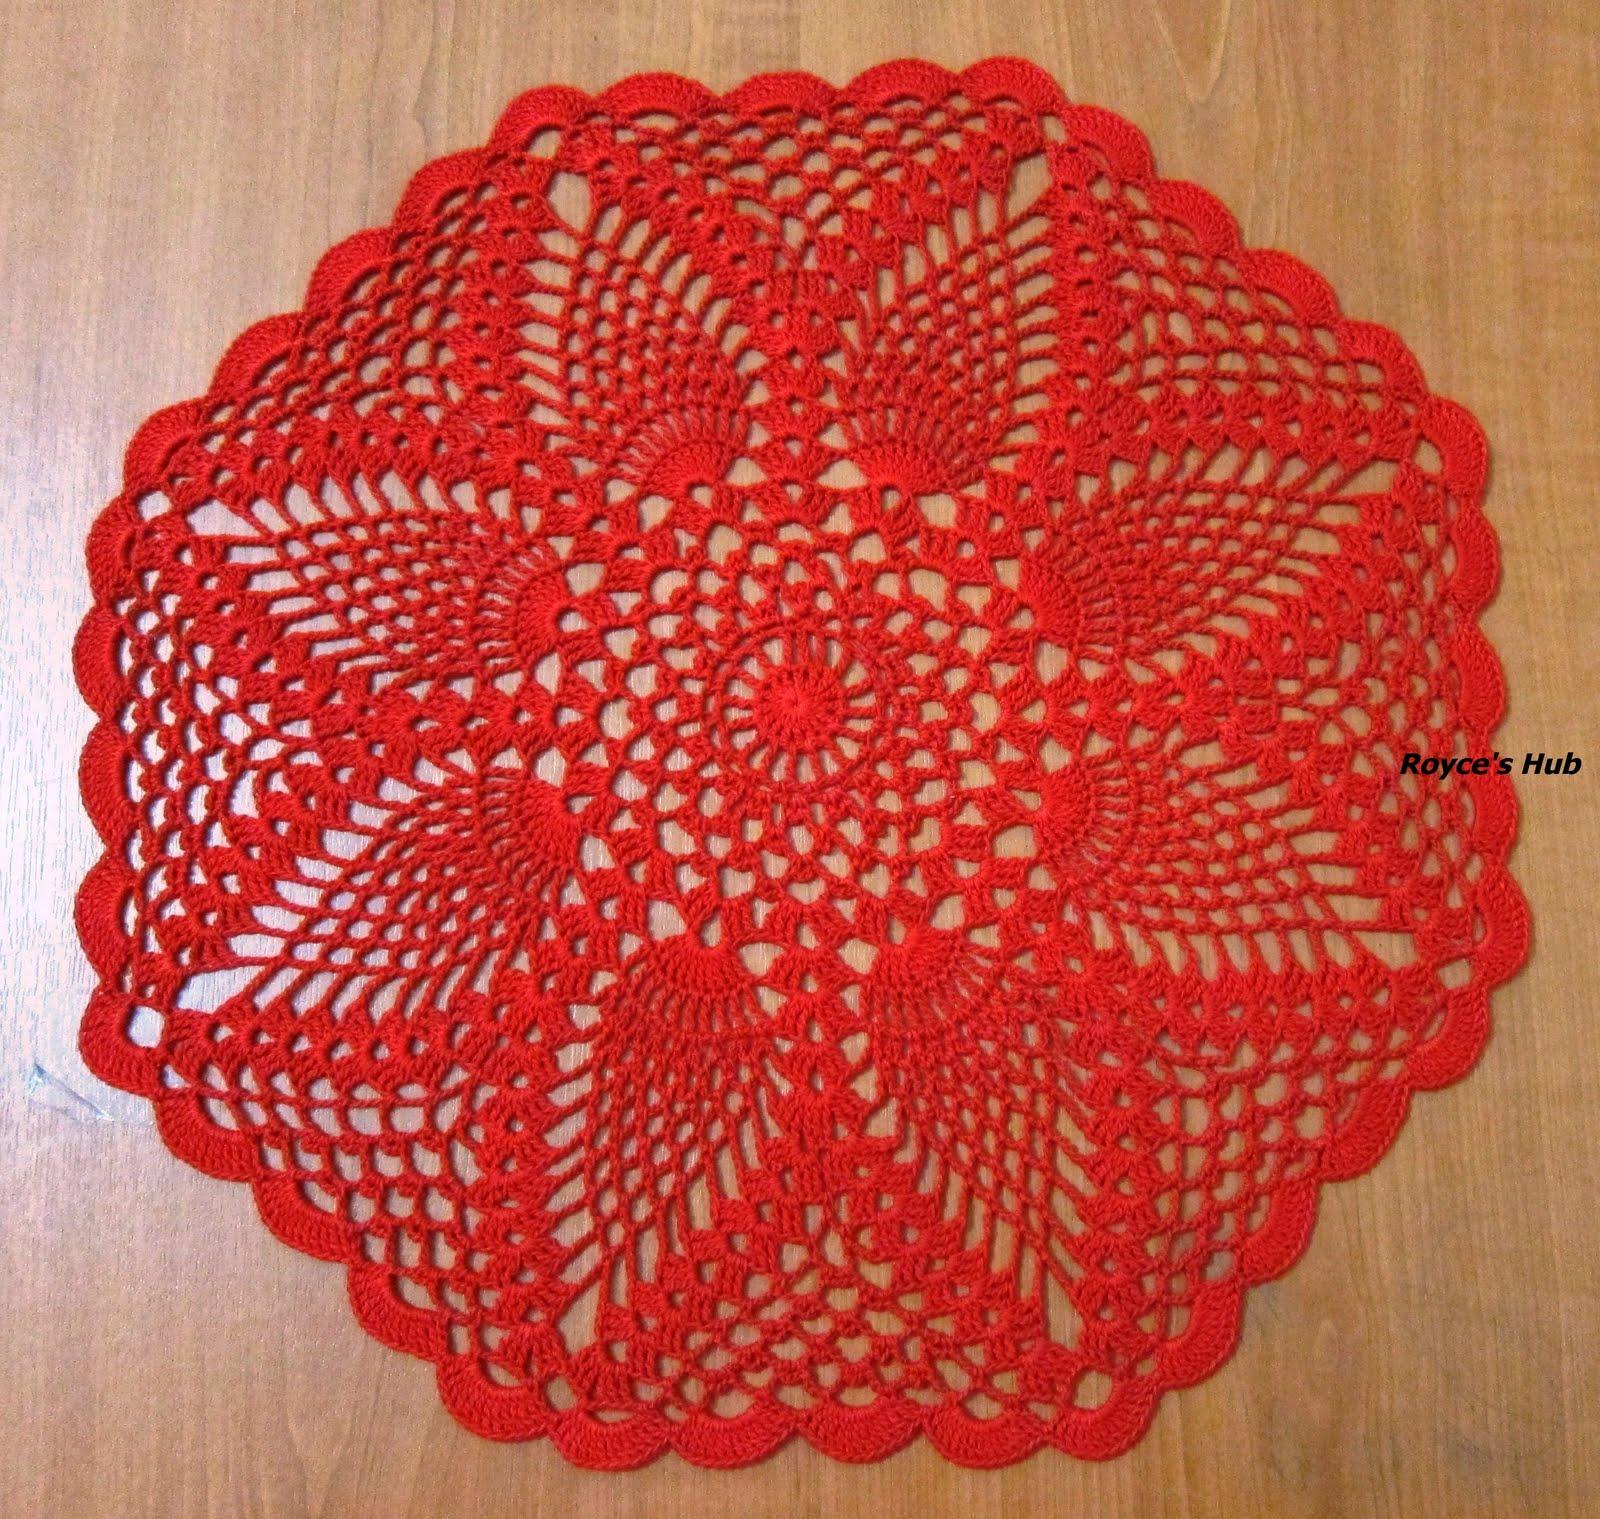 Royce\'s Hub: Crochet Pineapple Lace Octagon Doily